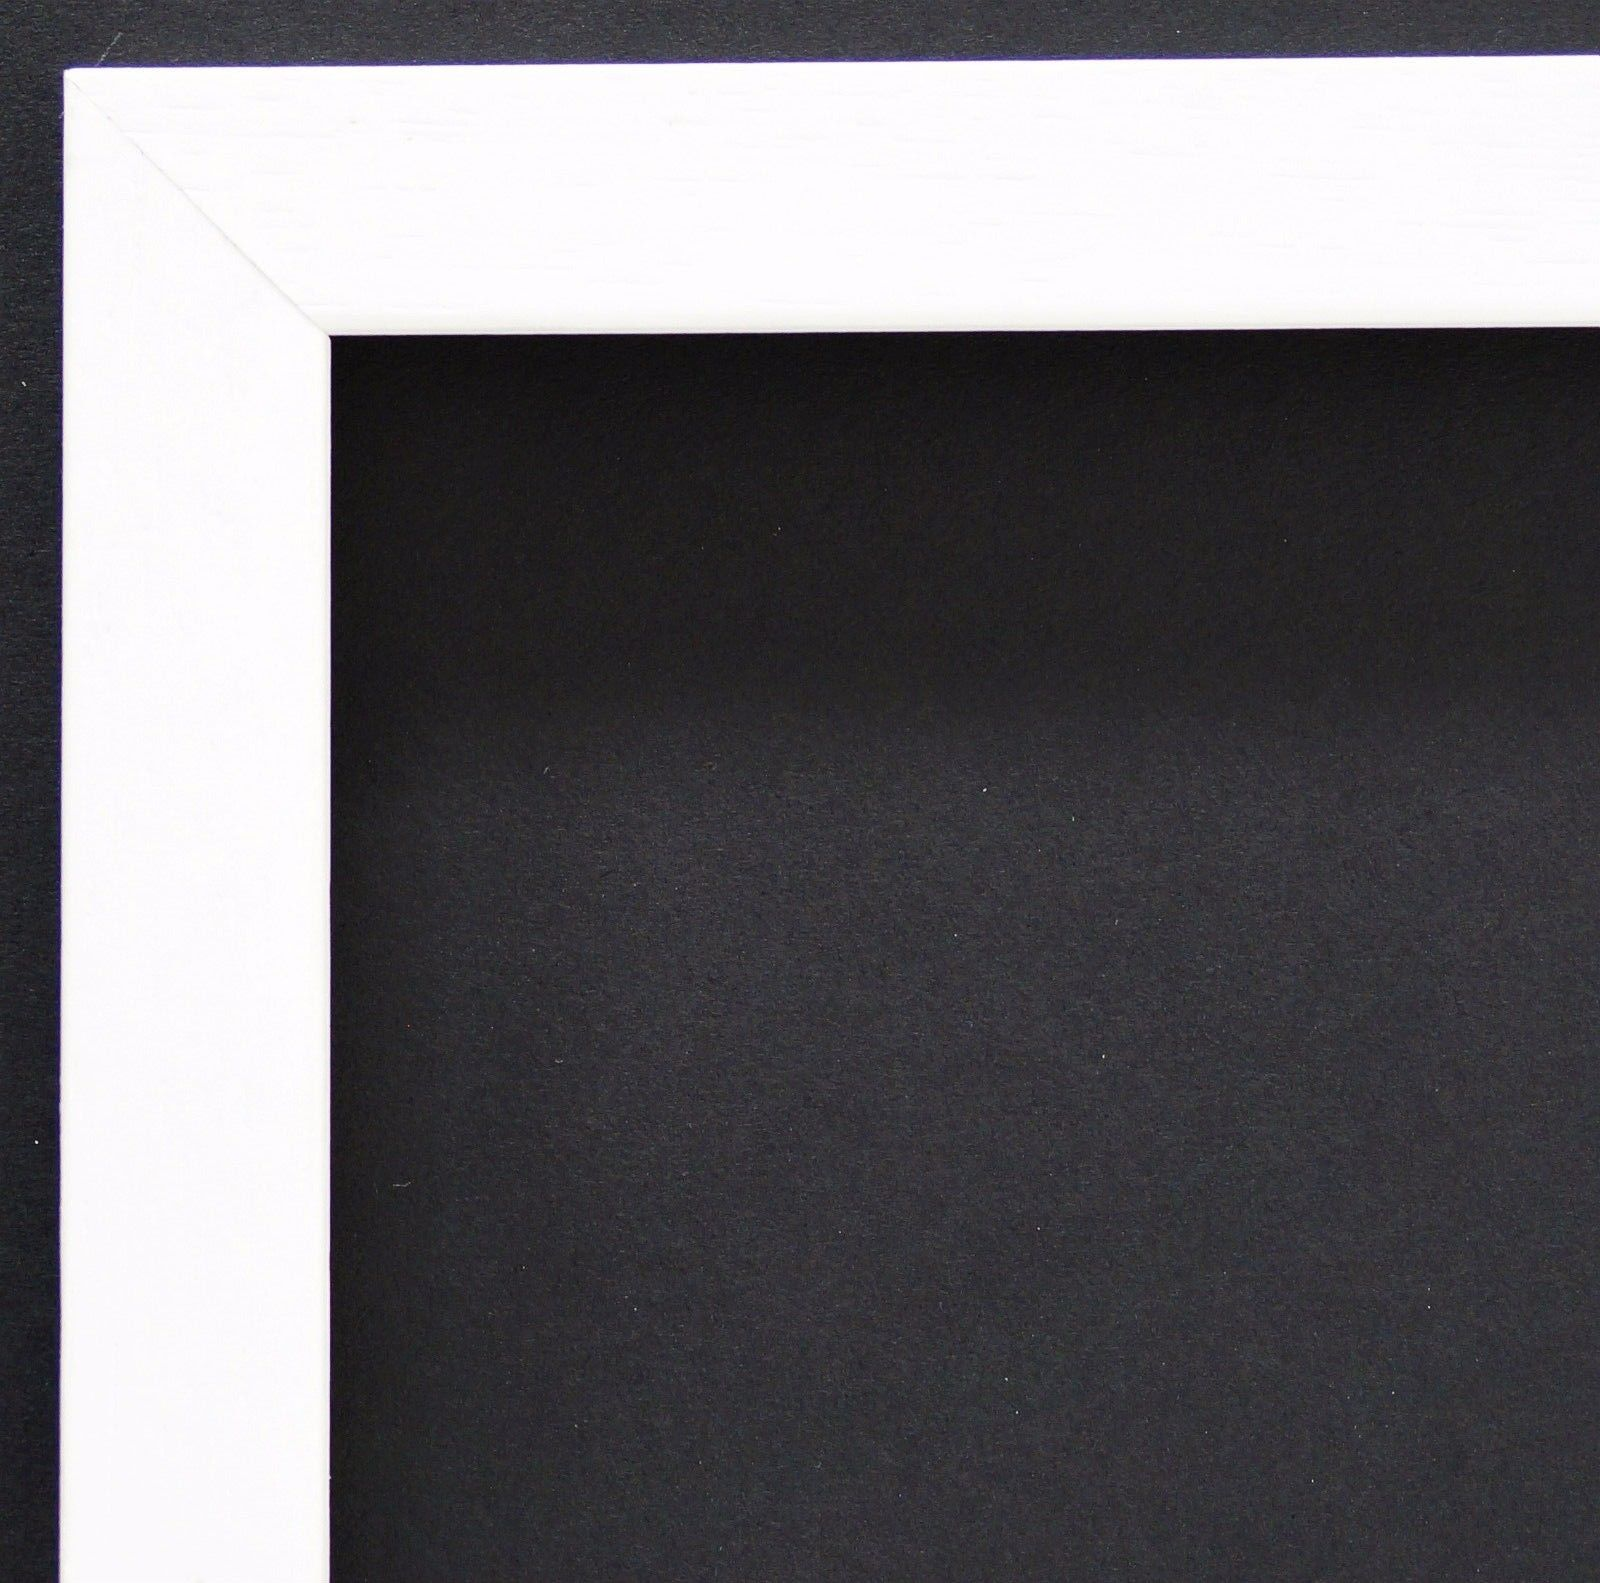 Fantastisch Rahmung Rahmen Bilder - Benutzerdefinierte Bilderrahmen ...